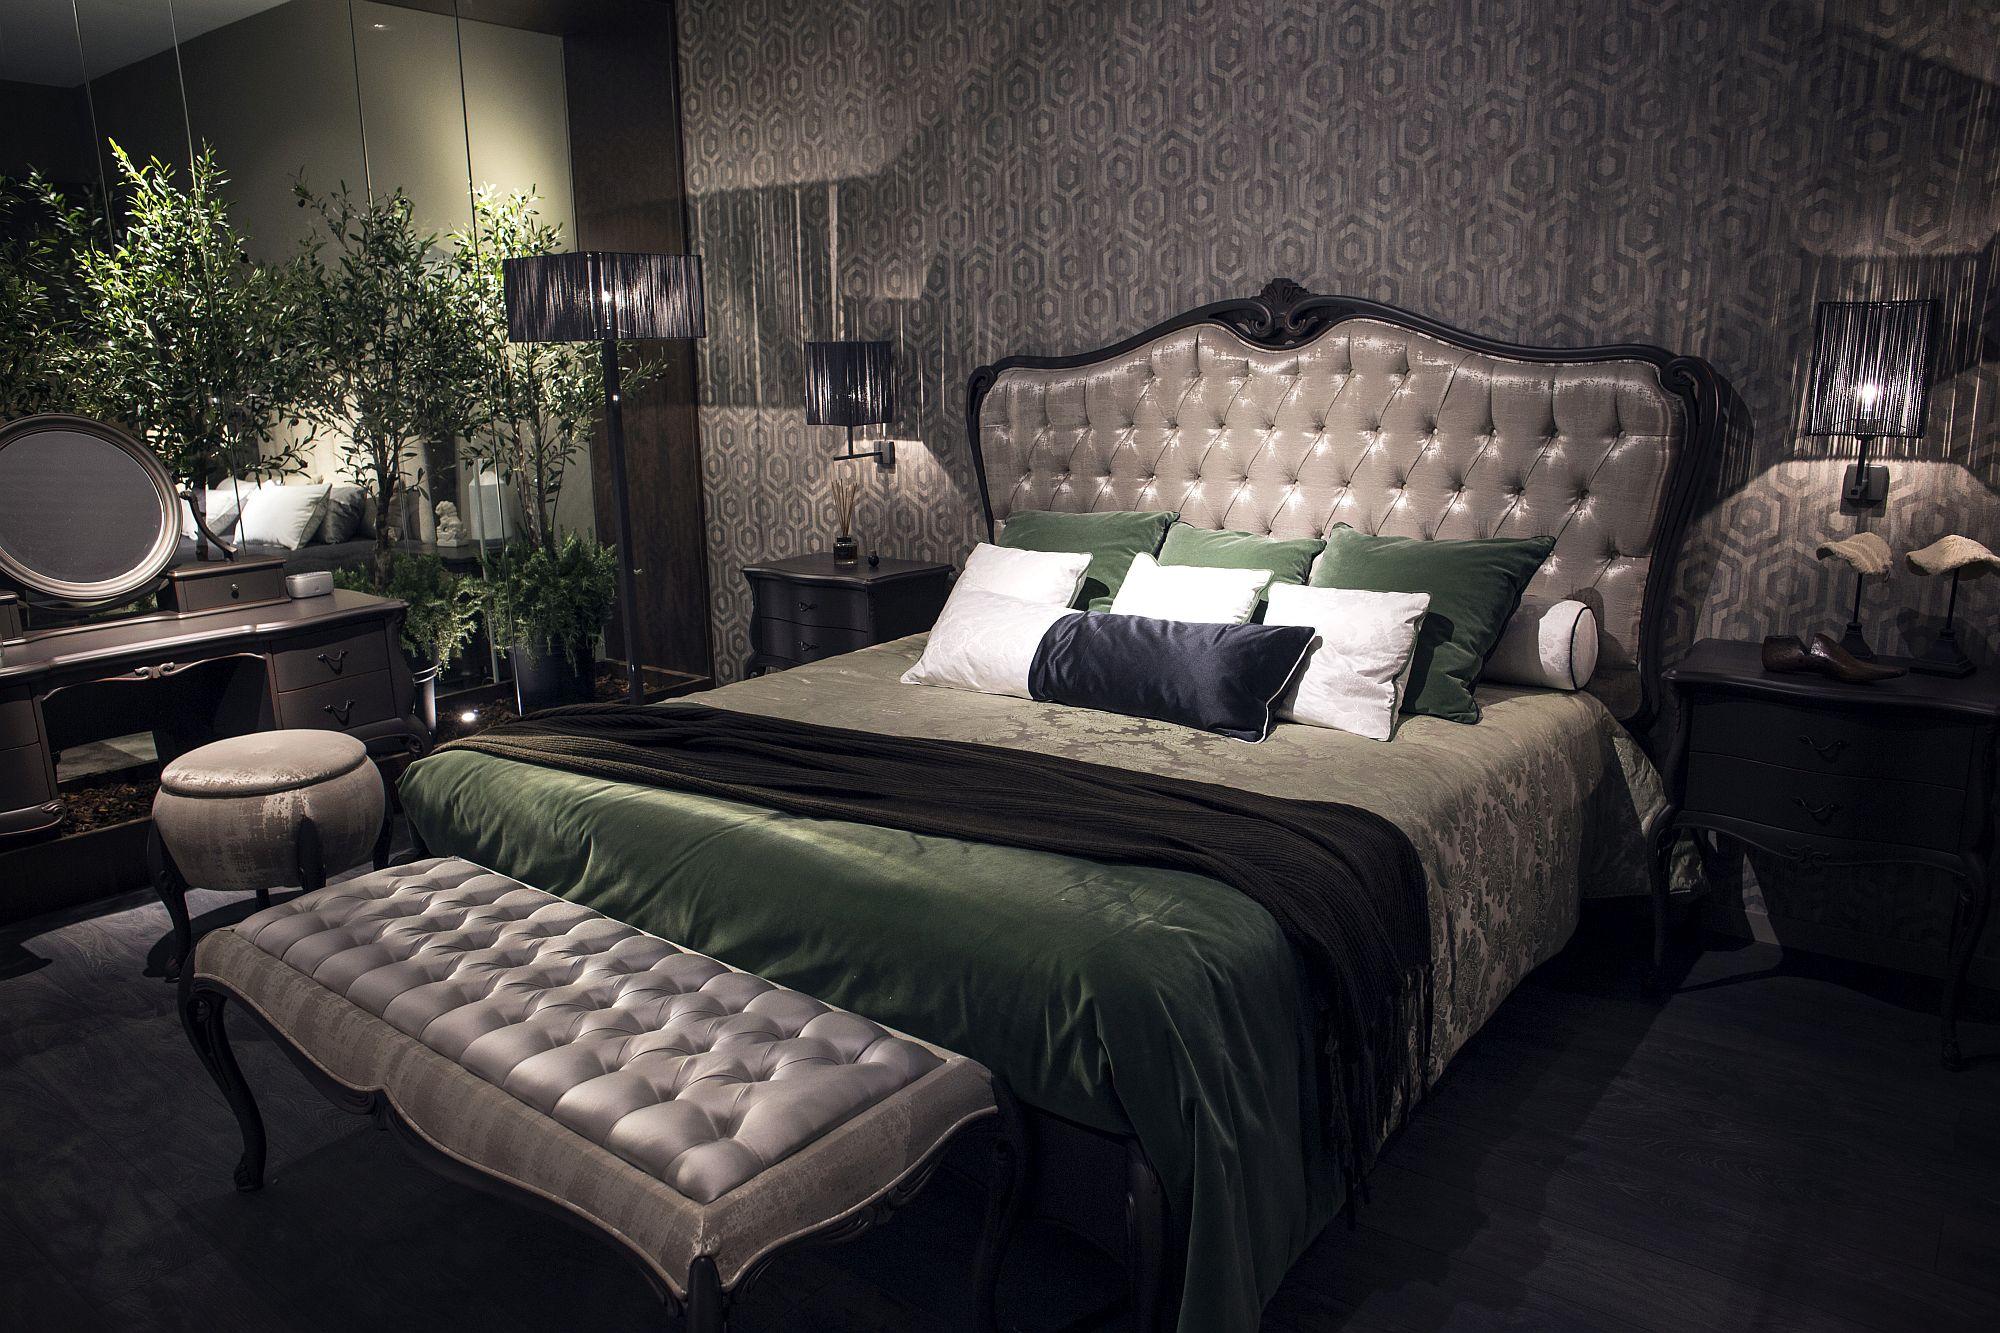 Find-some-space-for-indoor-plants-inside-your-modern-bedroom